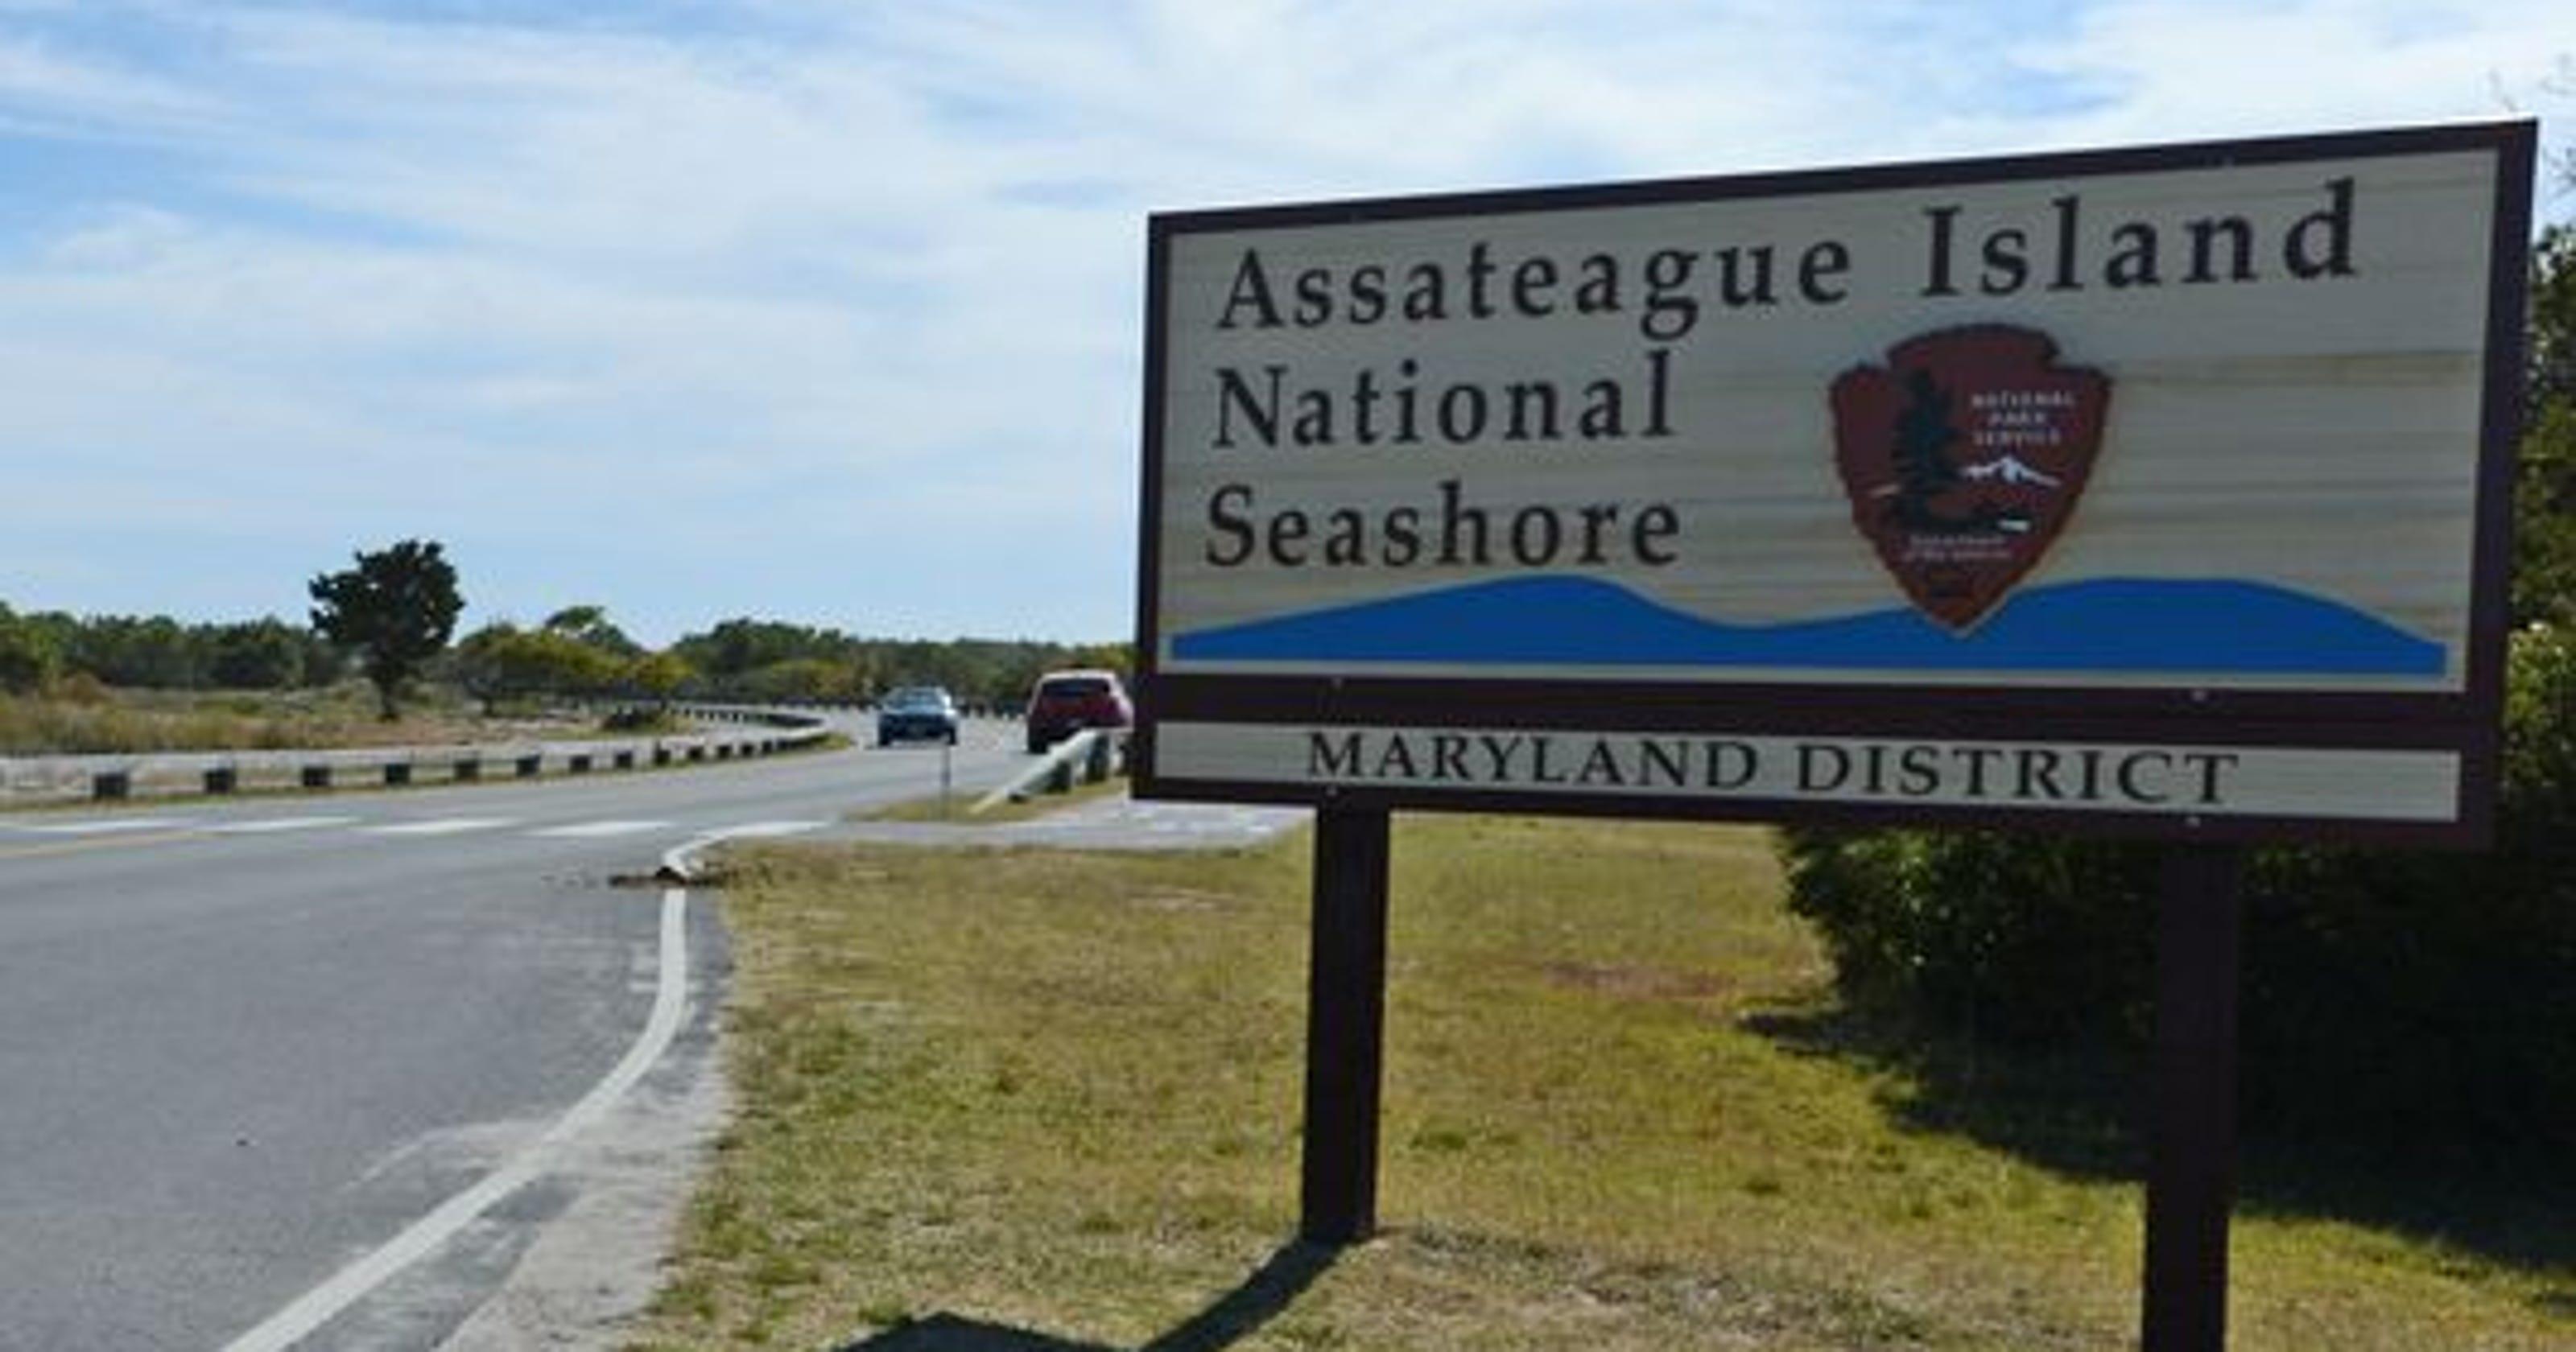 Swimmer drowns at Assateague Island National Seashore